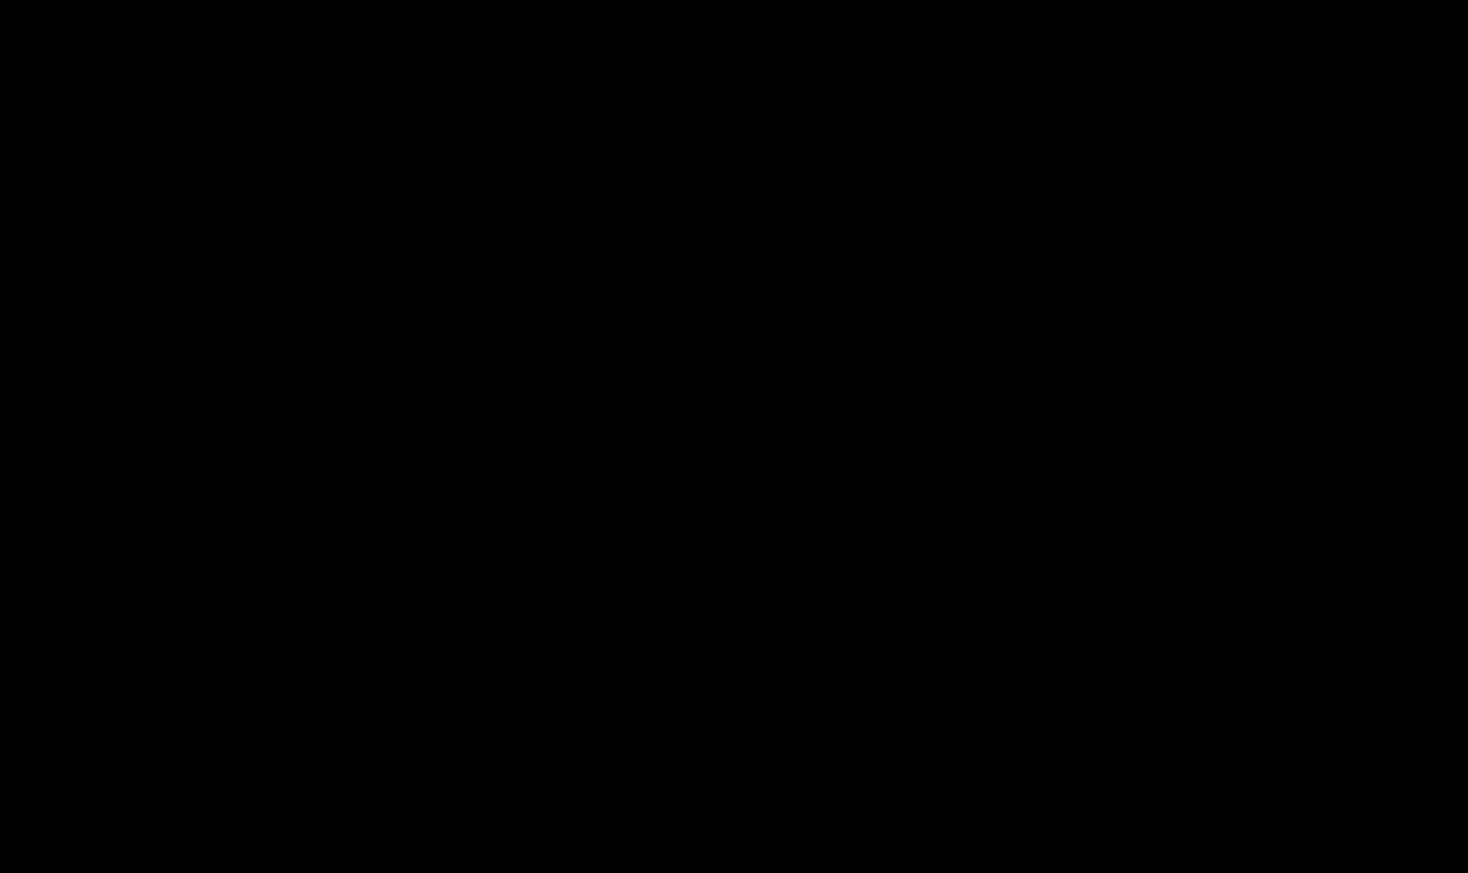 DBCO-dPEG®₄-MAL